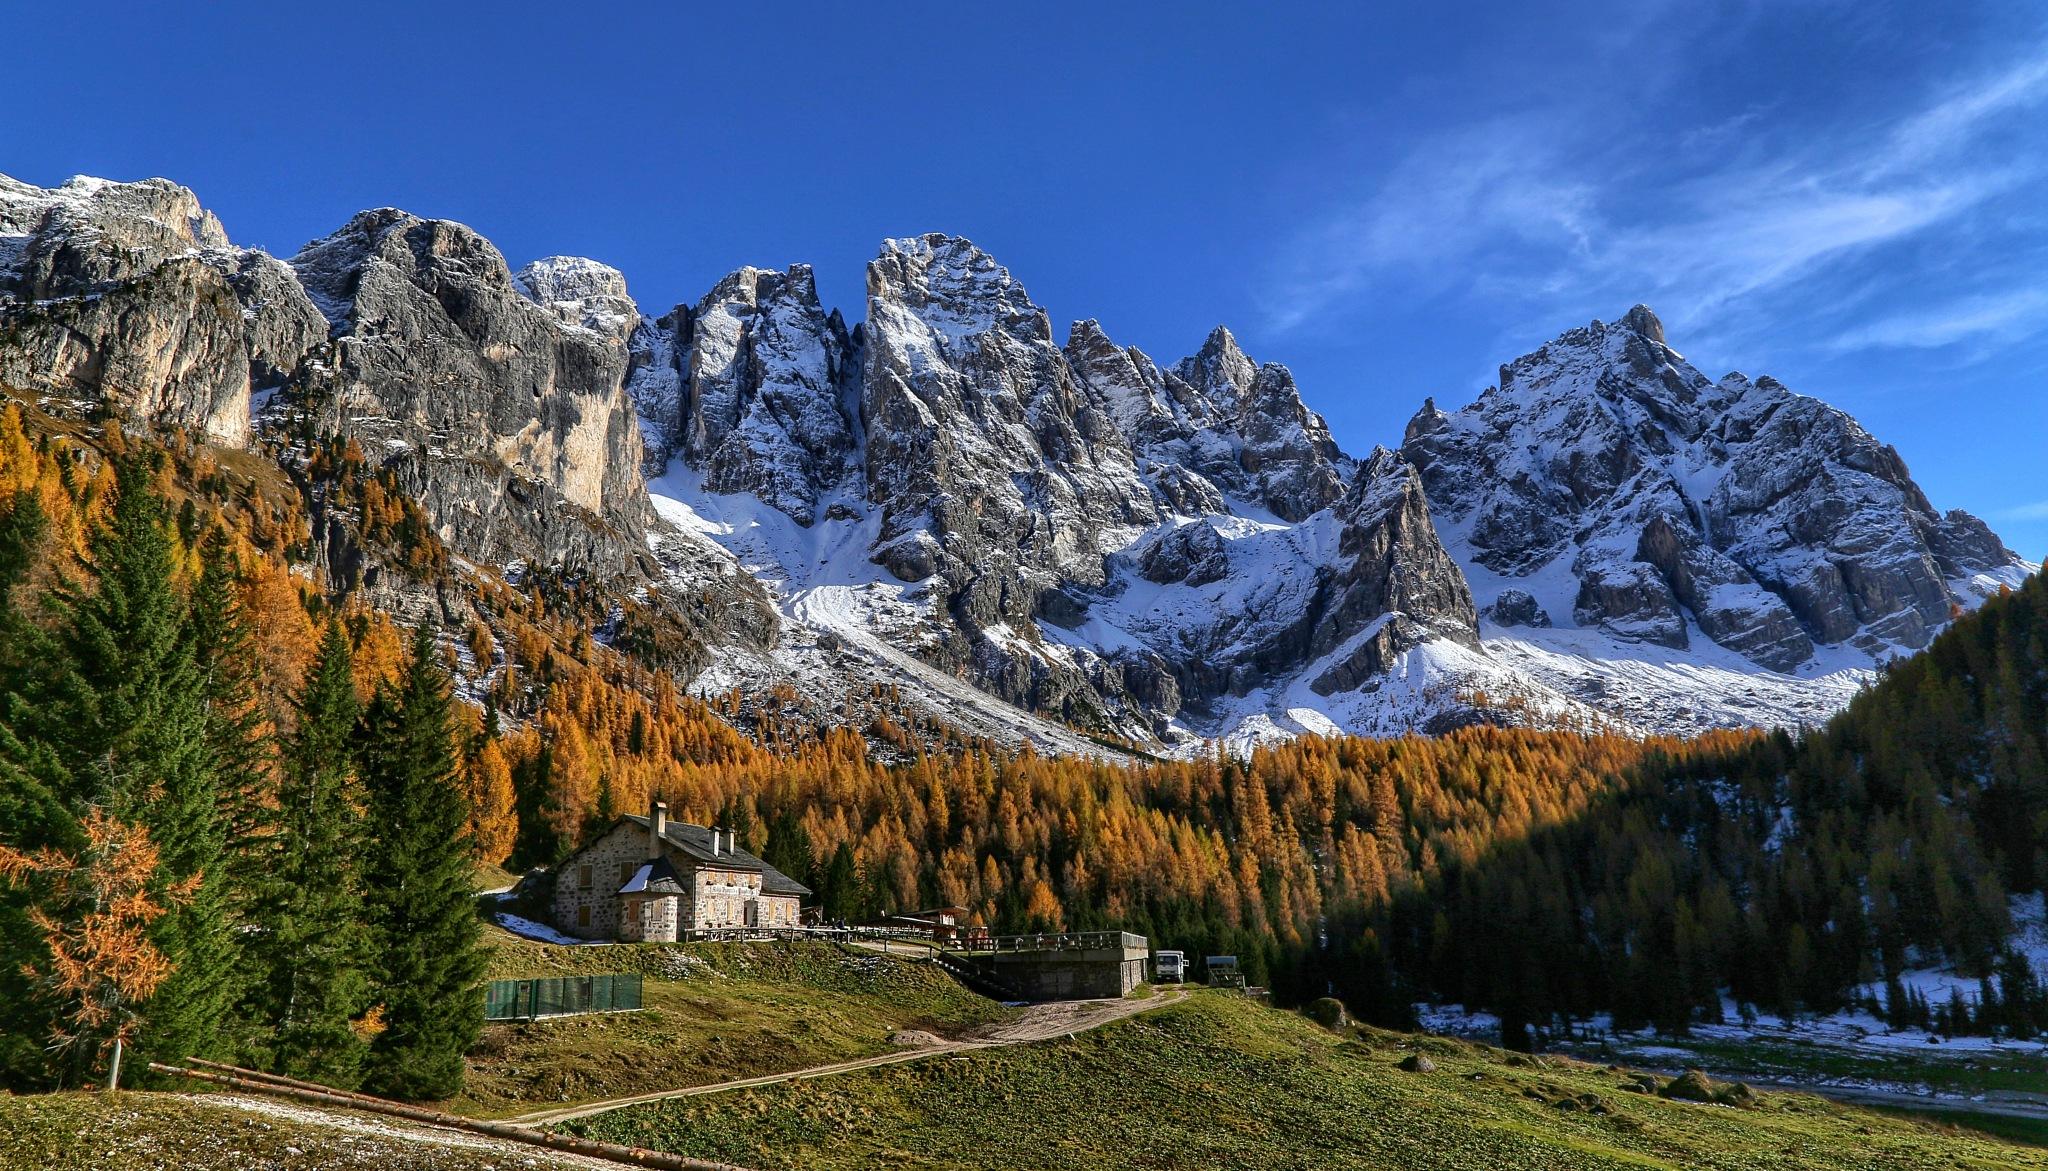 Venegia Valley Dolomites TrentinoAltoadige Italy by Cristian Stablum